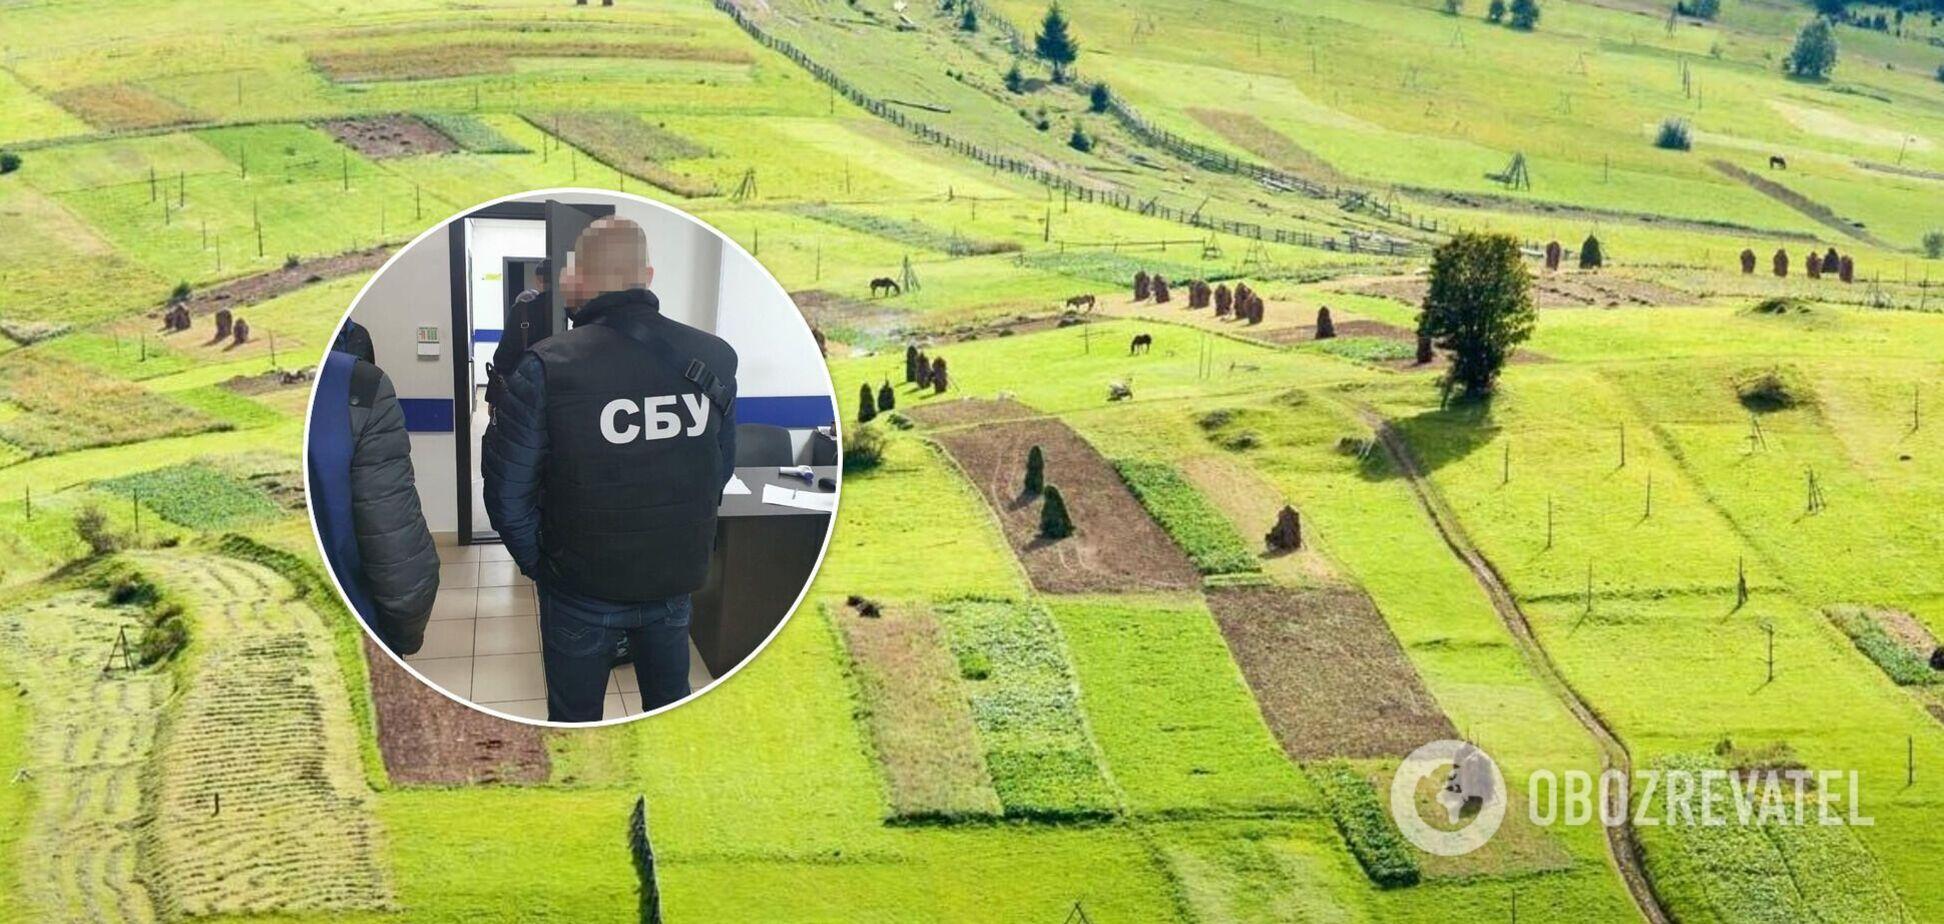 Агрохолдинг із чиновниками Держгеокадастру привласнили землі на 80 млн грн – СБУ